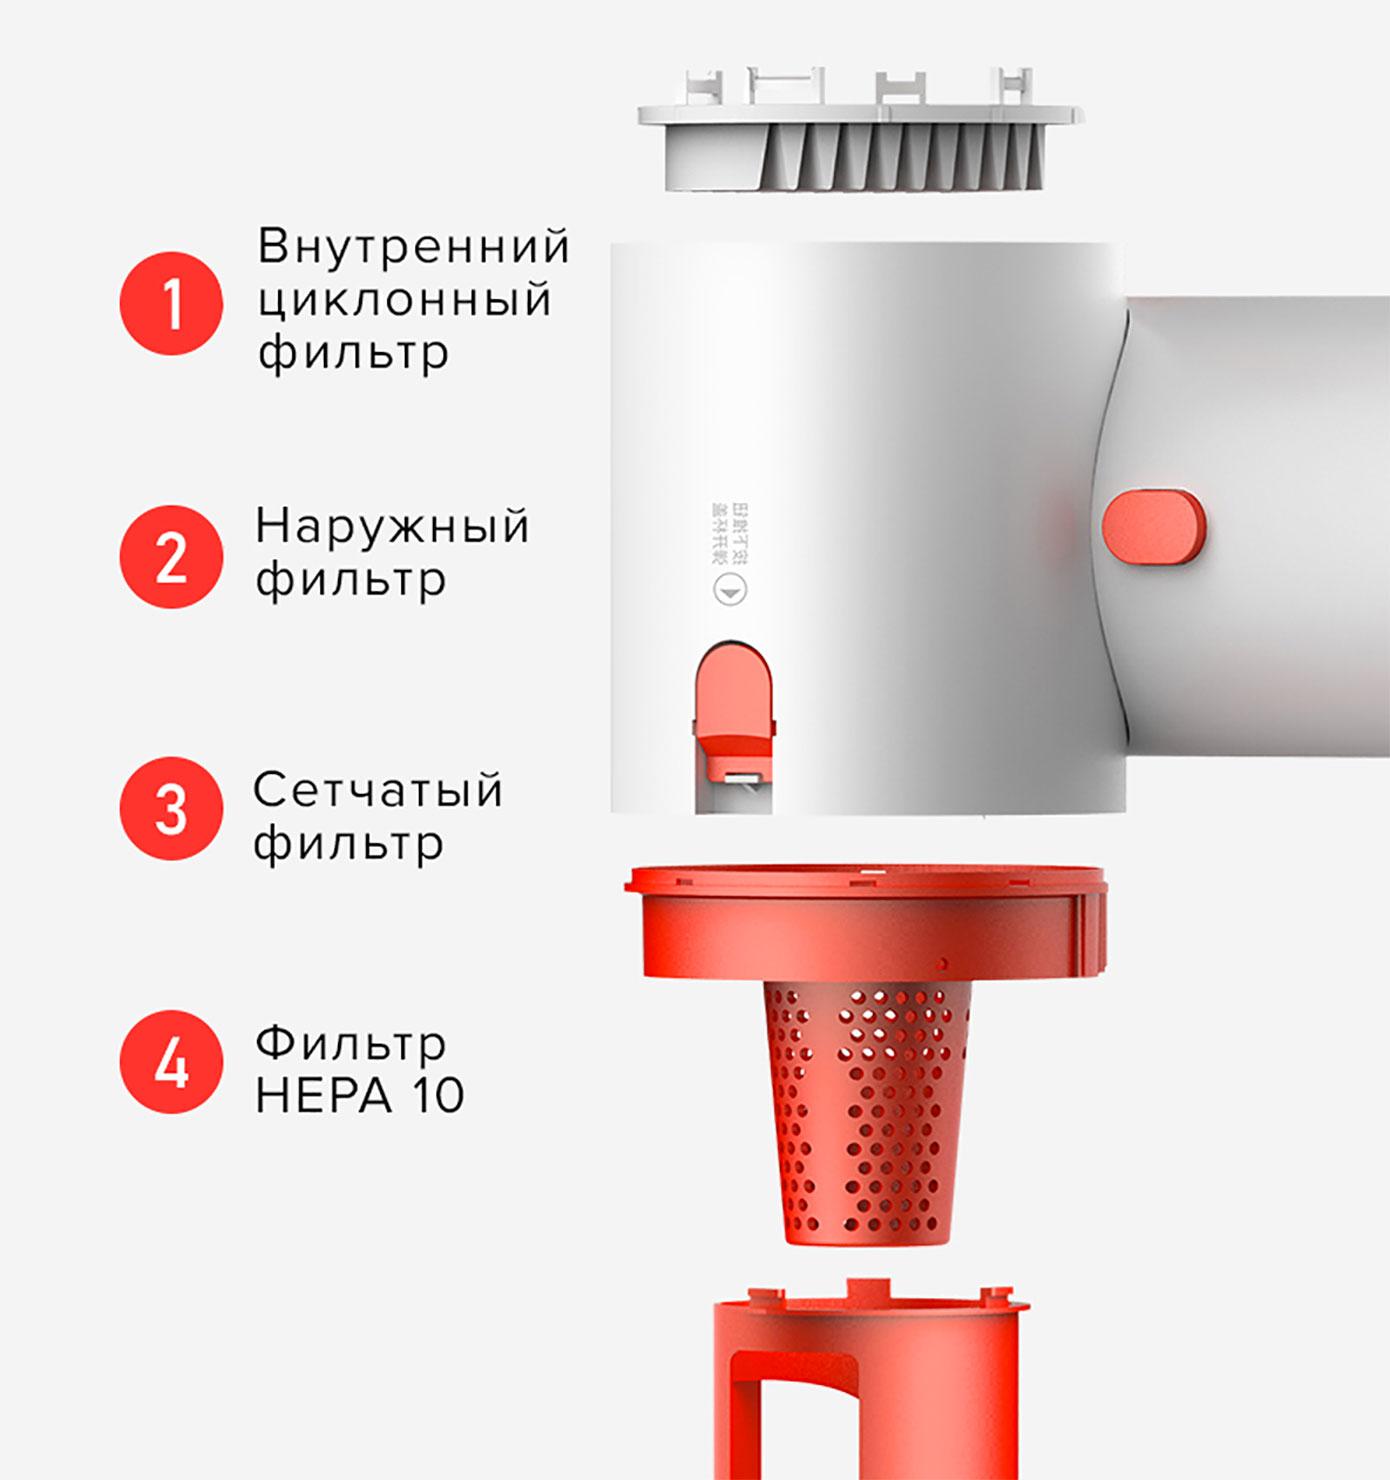 Opisanie Besprovodnoj Ruchnoj Pylesos Deerma Vc25 Wireless Vacuum Cleaner Dem Vc25 12